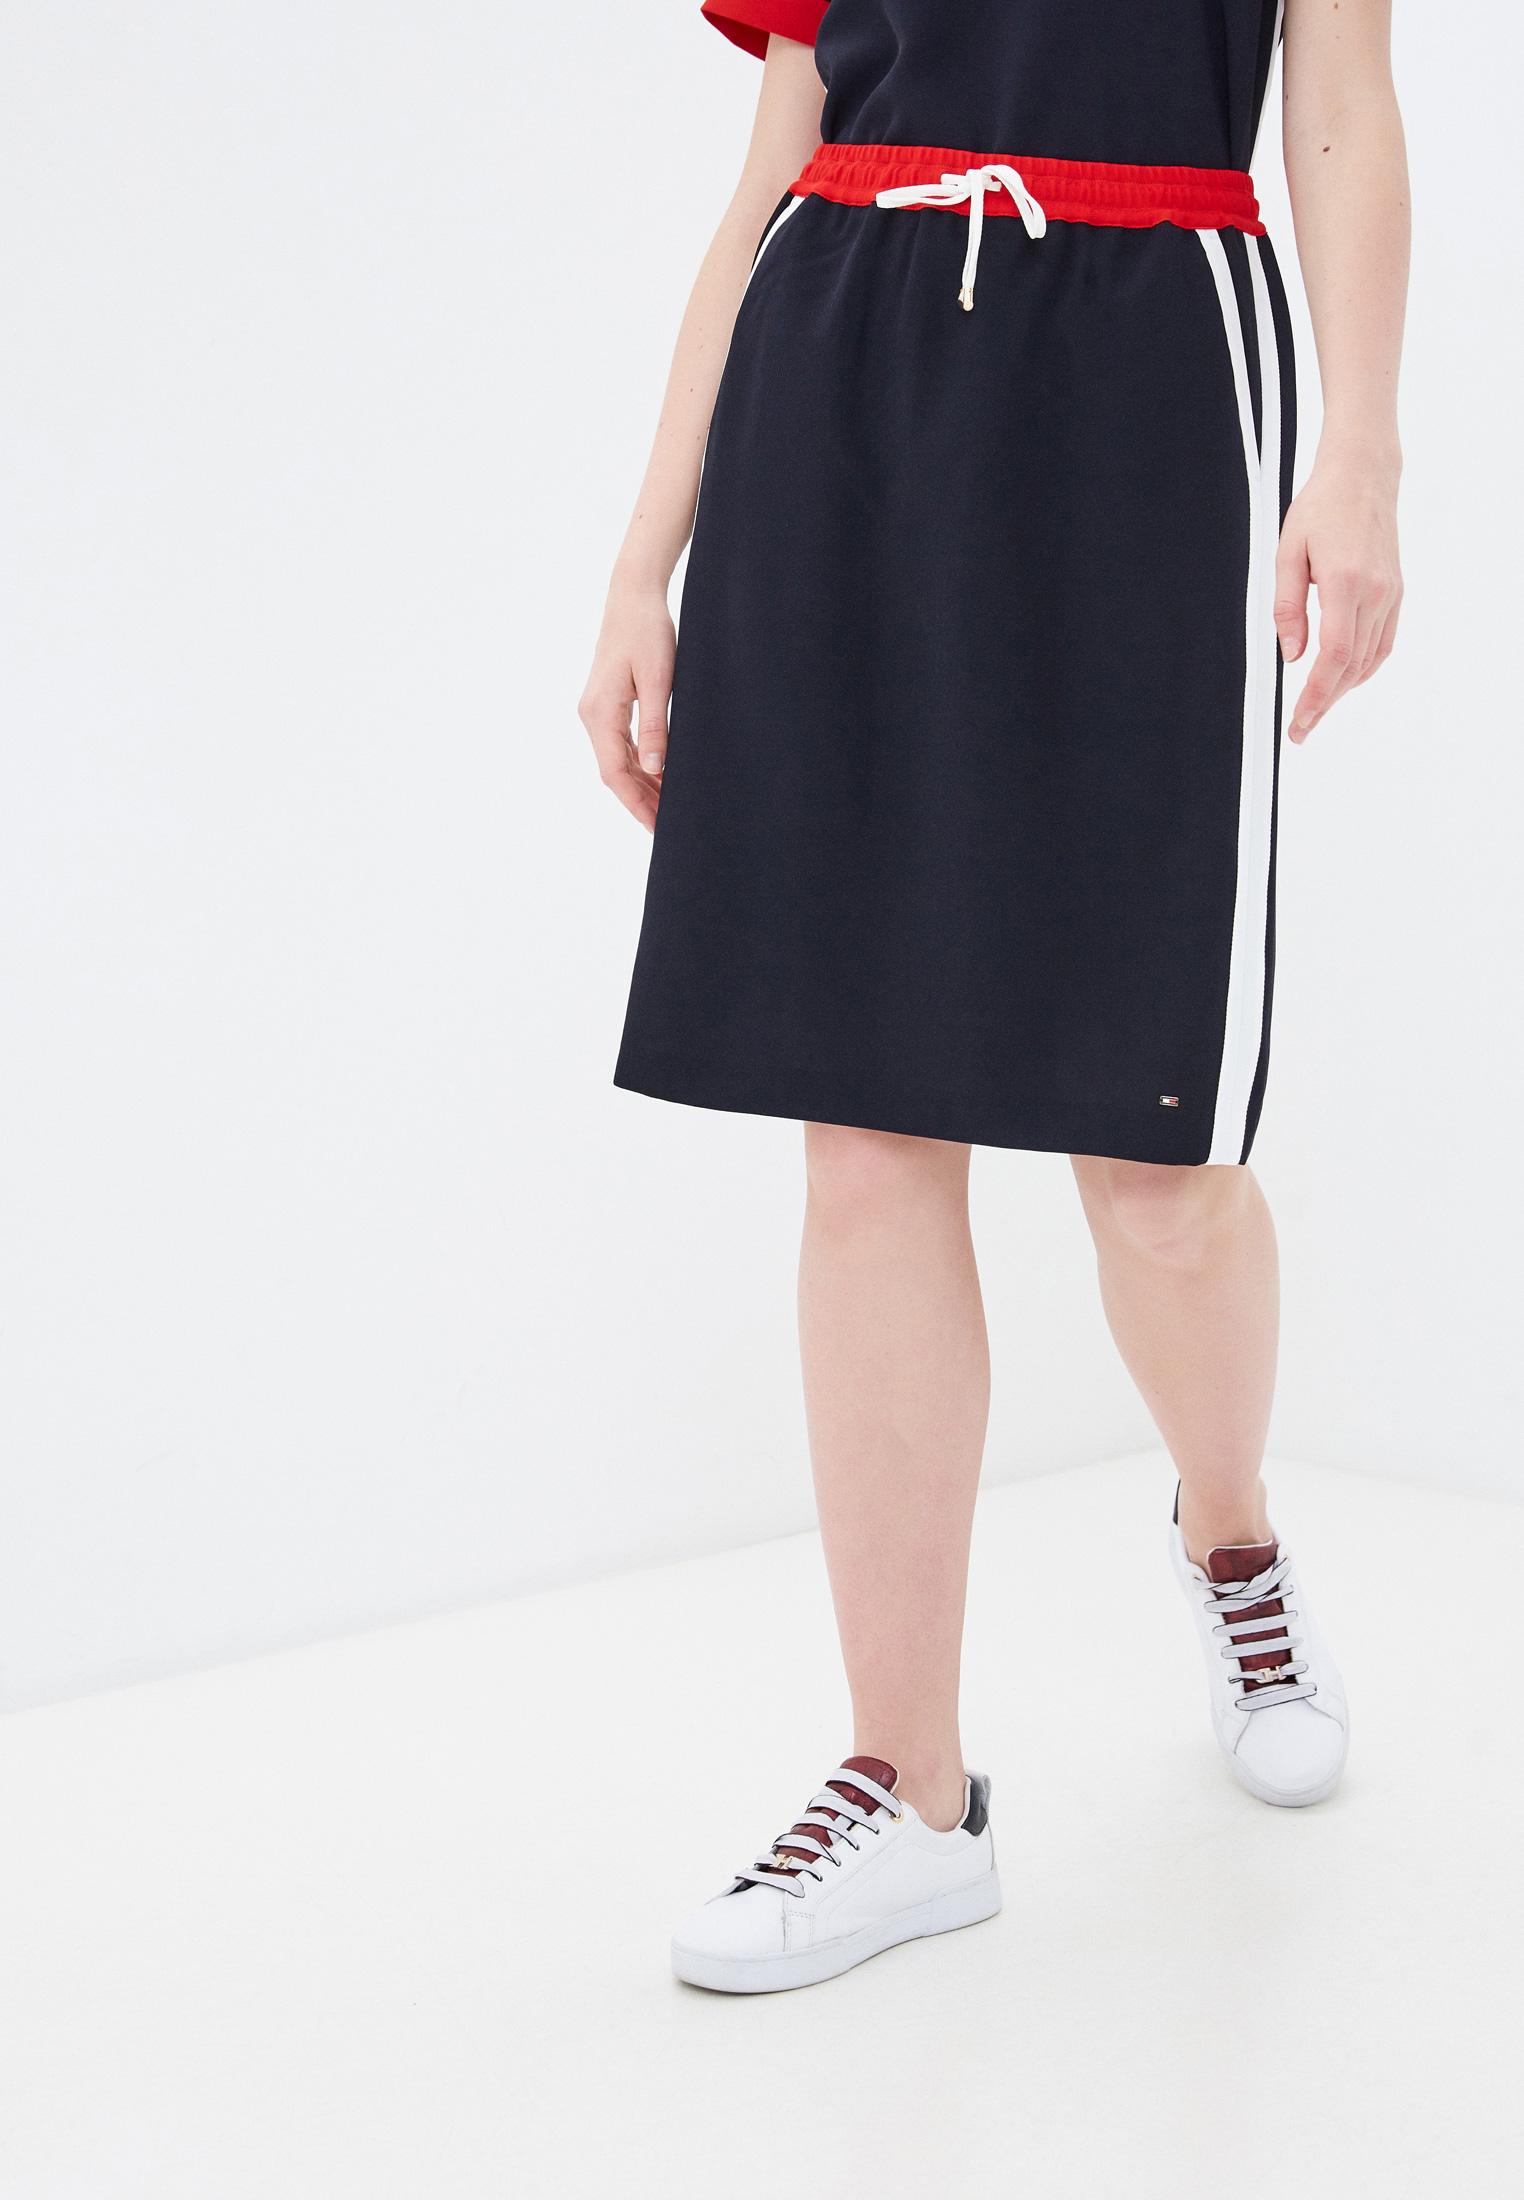 Прямая юбка Tommy Hilfiger (Томми Хилфигер) WW0WW30635